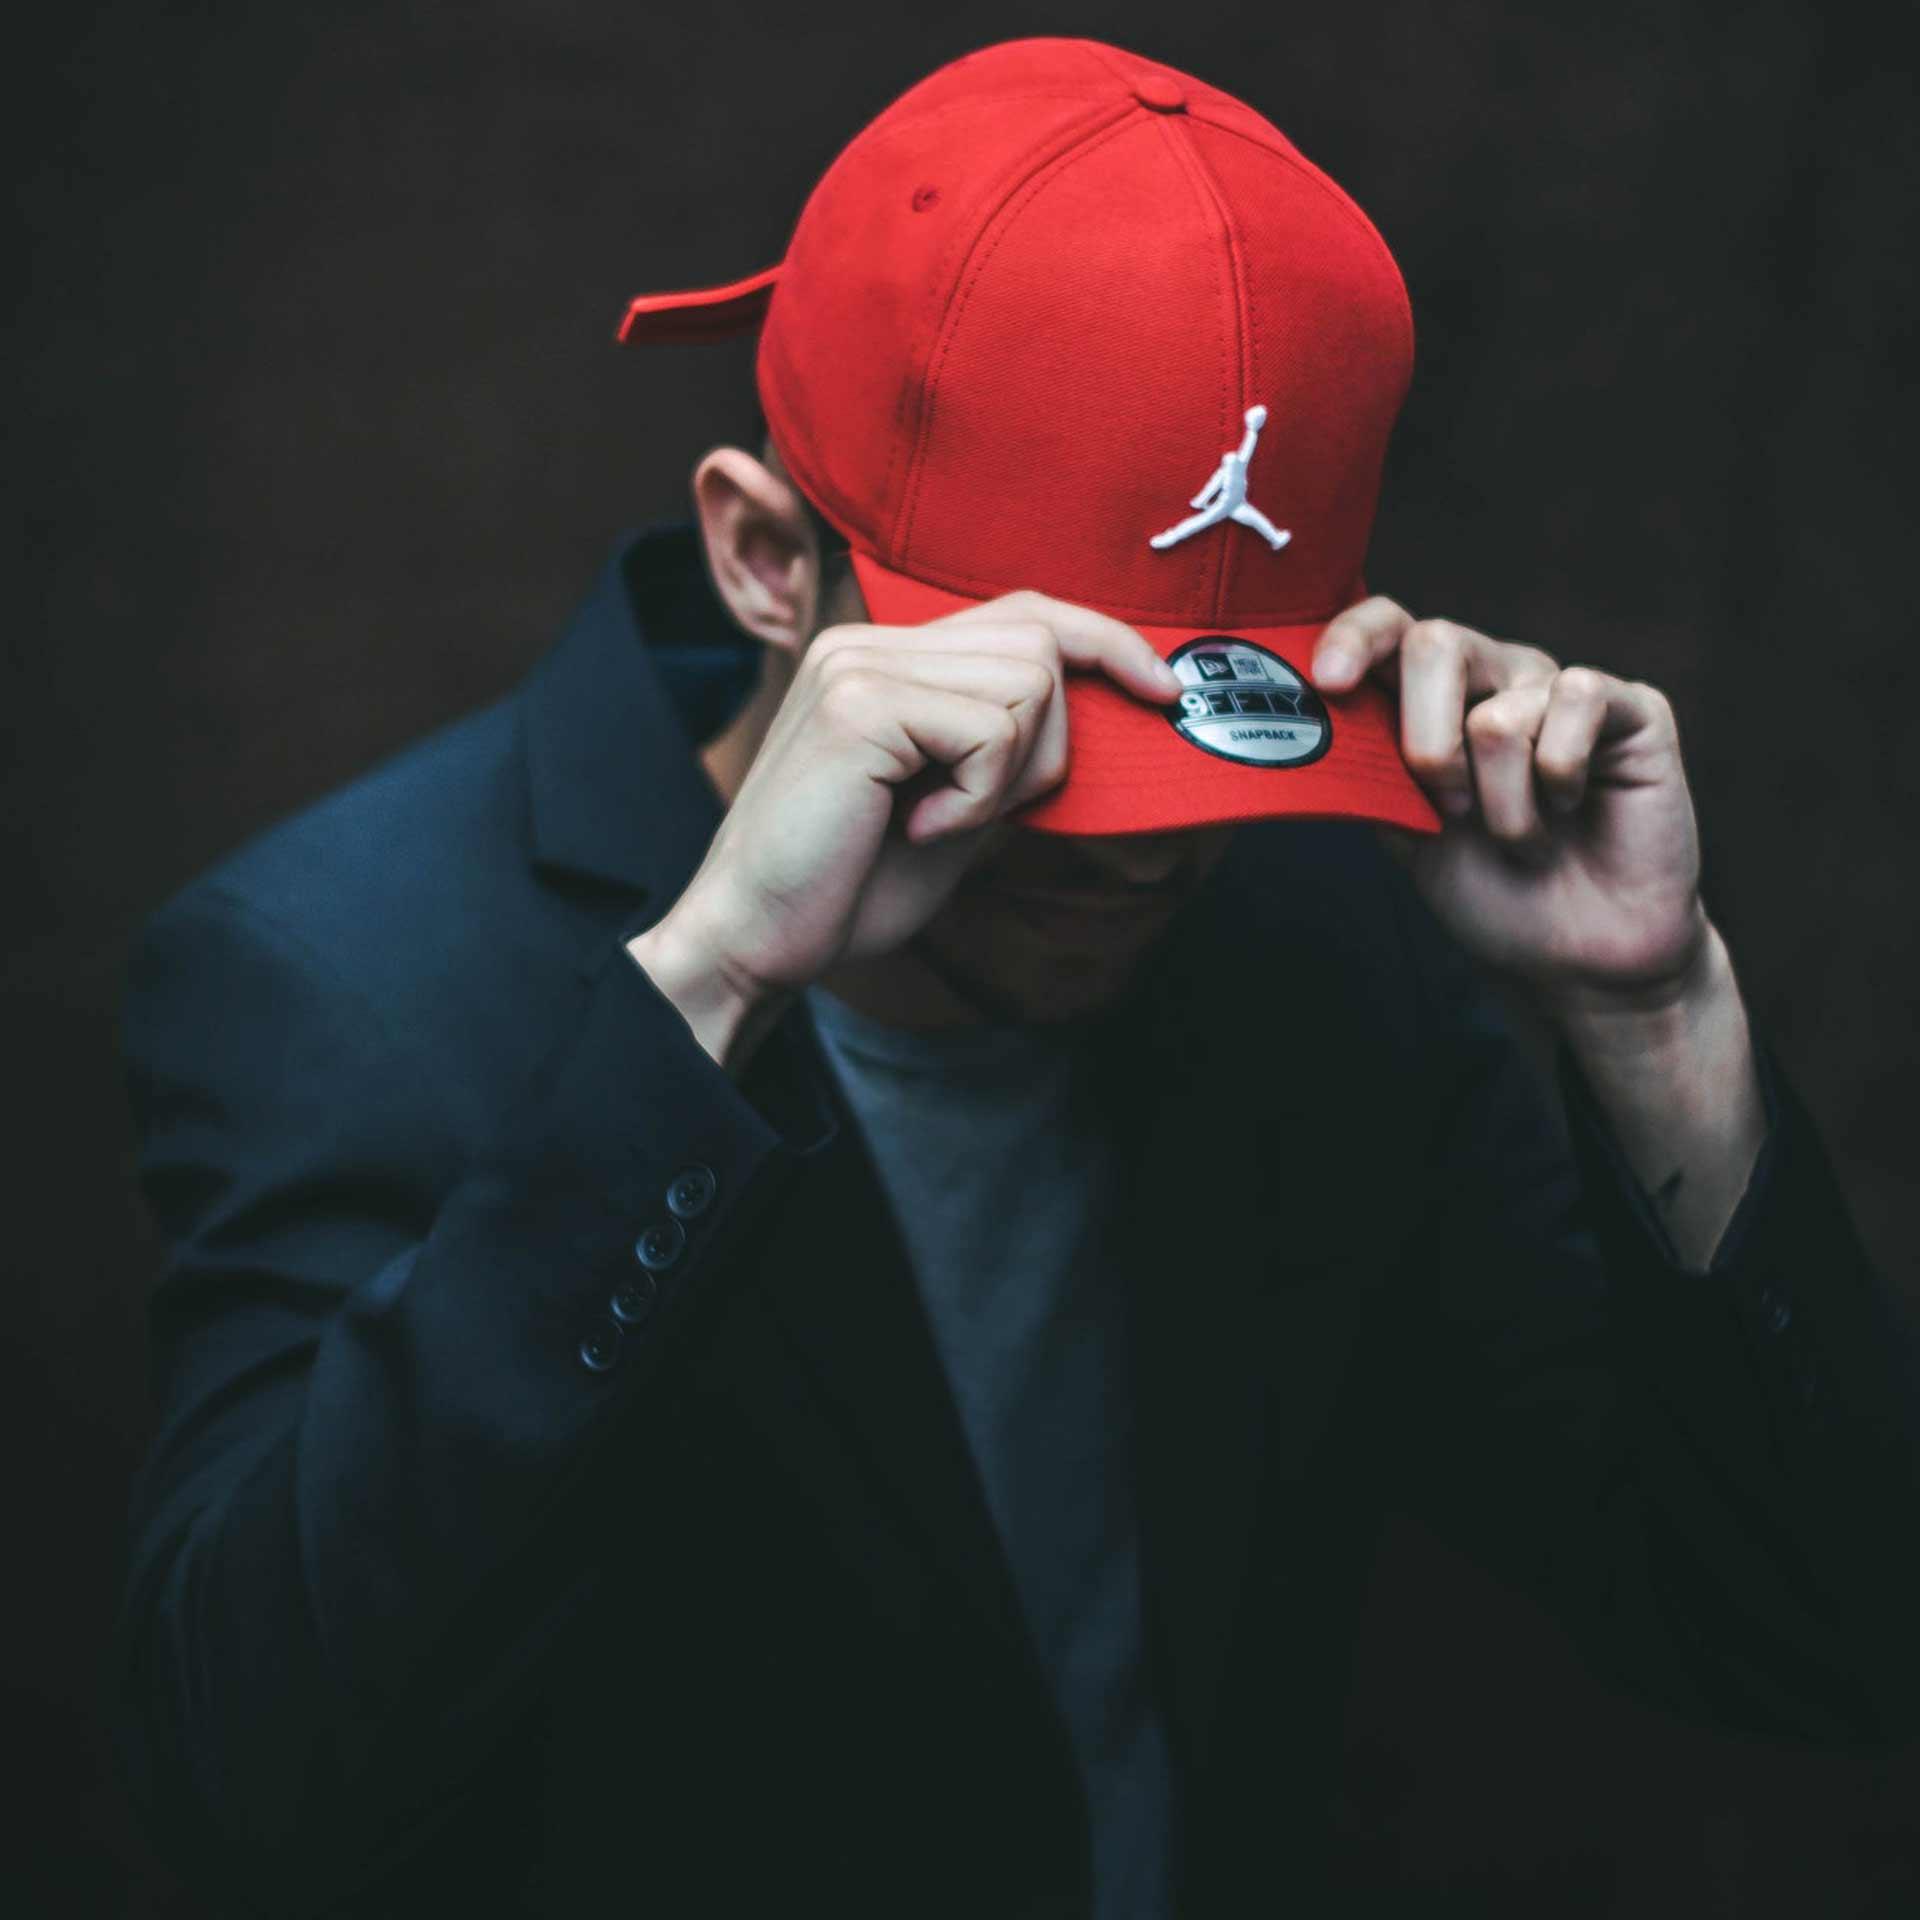 red-air-jordan-baseball-cap-3452649